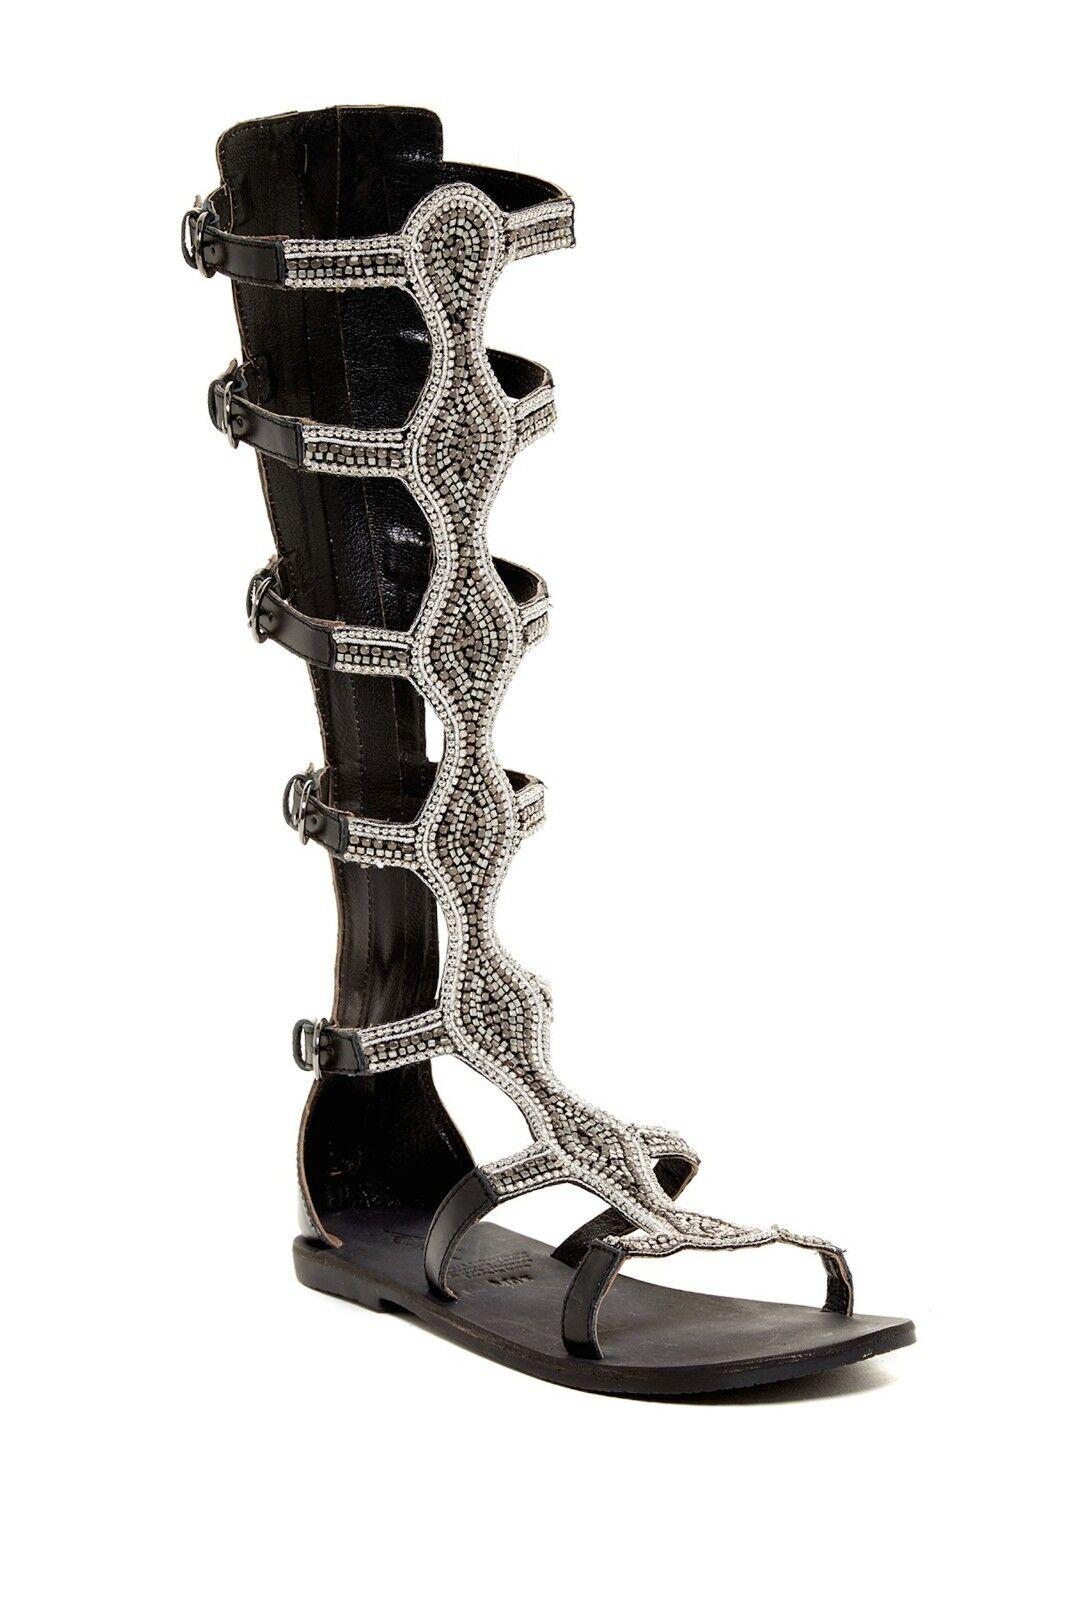 REBELS Velocity High Back Leather Gladiator Beaded Sandals Sandals Sandals Black Sz 6  179 NIB 172574